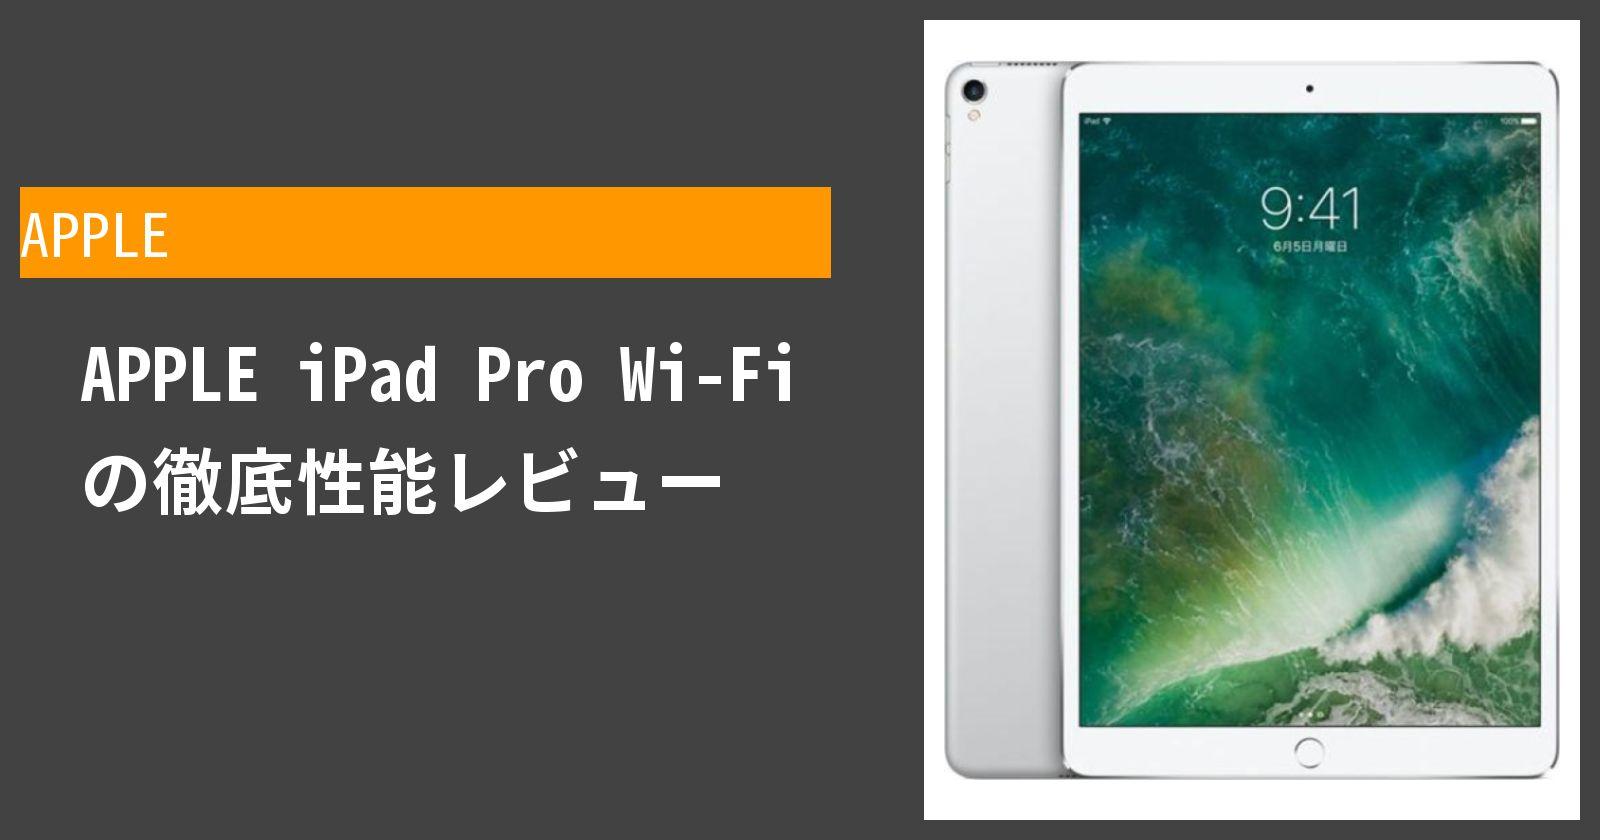 iPad Pro Wi-Fi の徹底性能レビュー